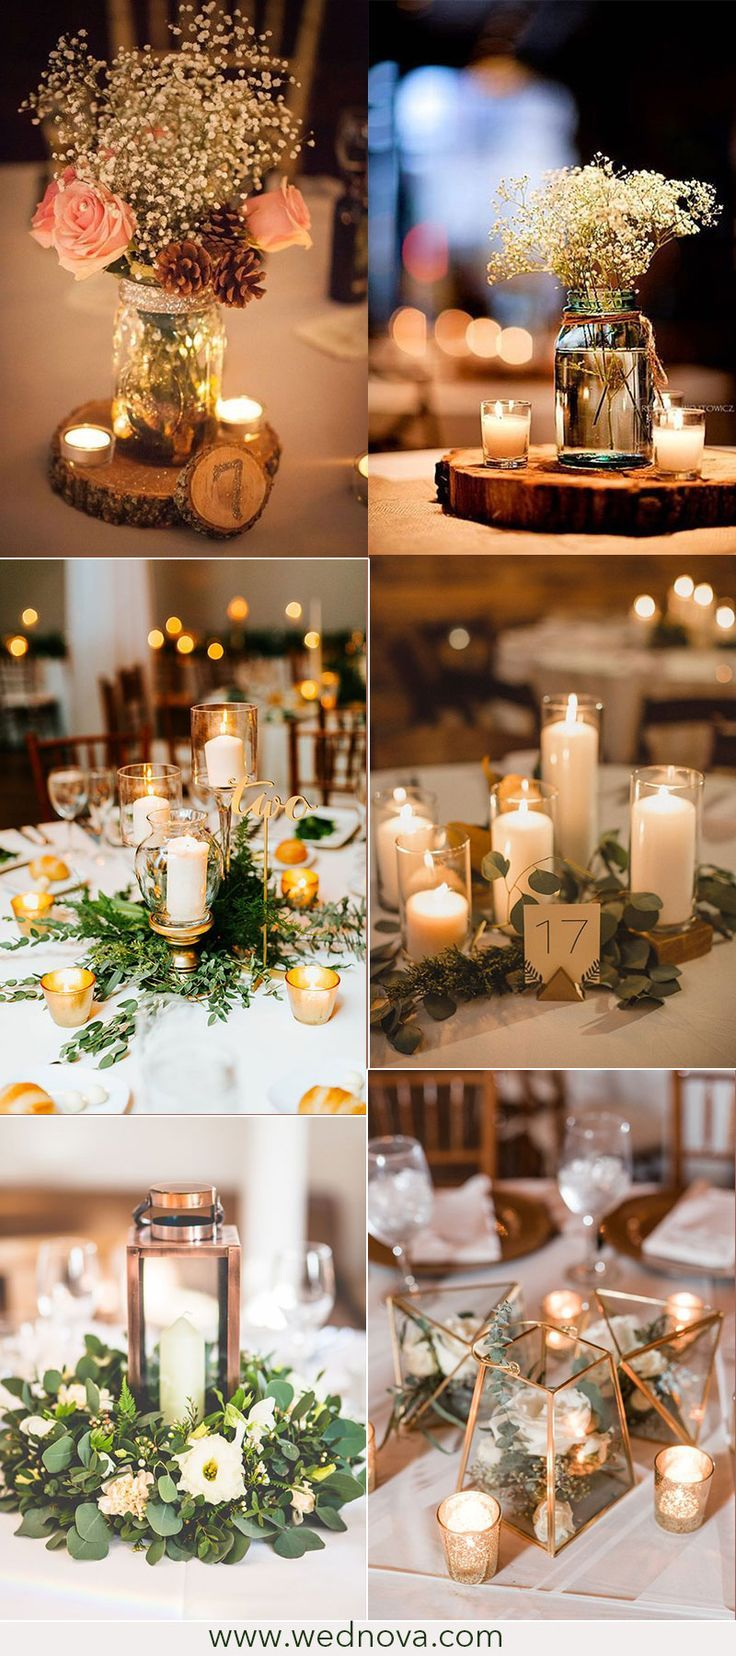 32 Greenery Wedding Decor Ideas Budget And Eco Friendly